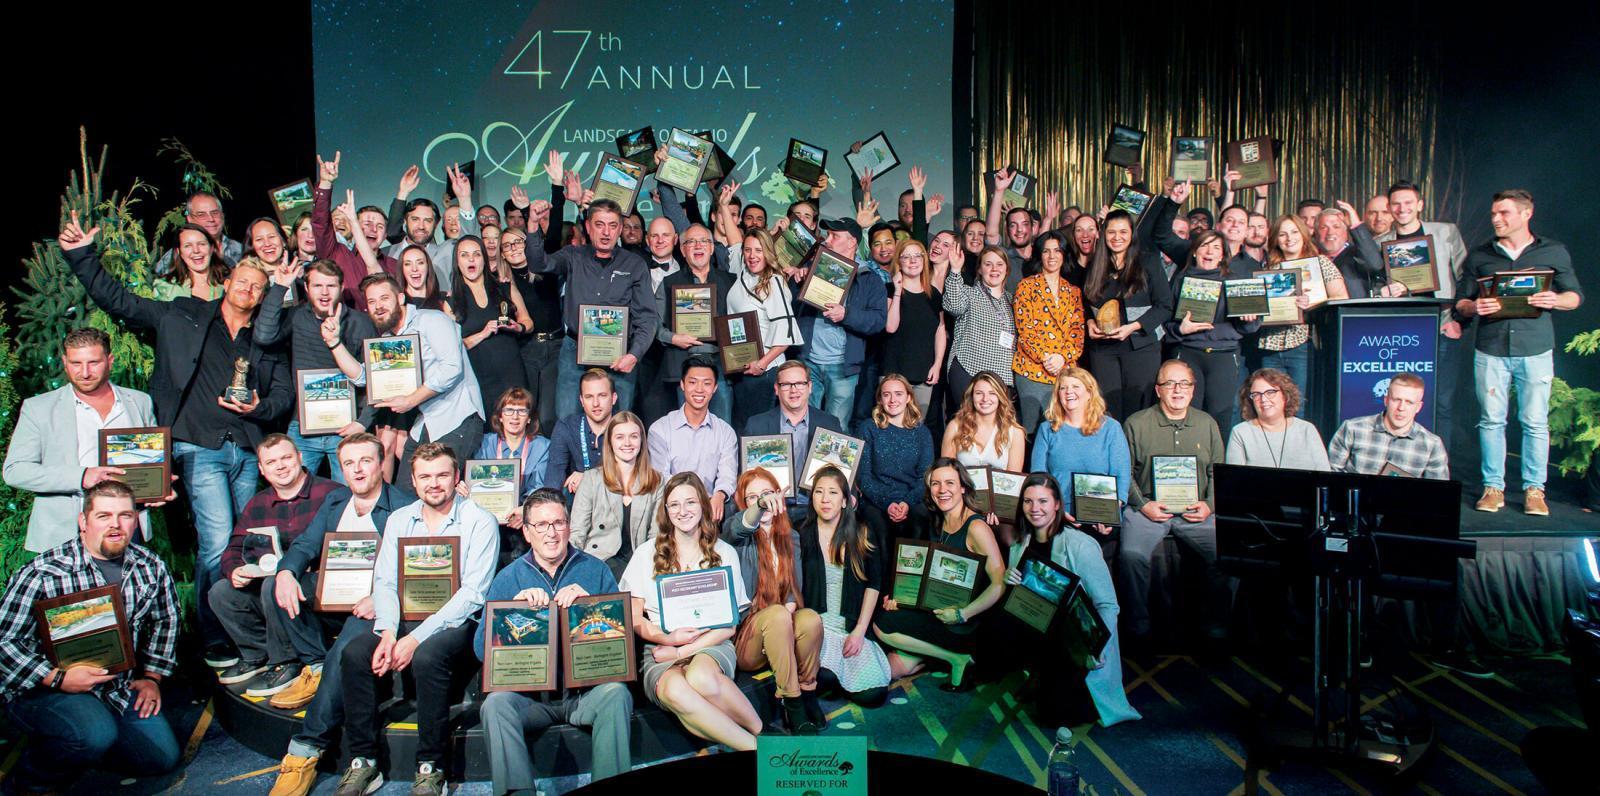 Awards past winners